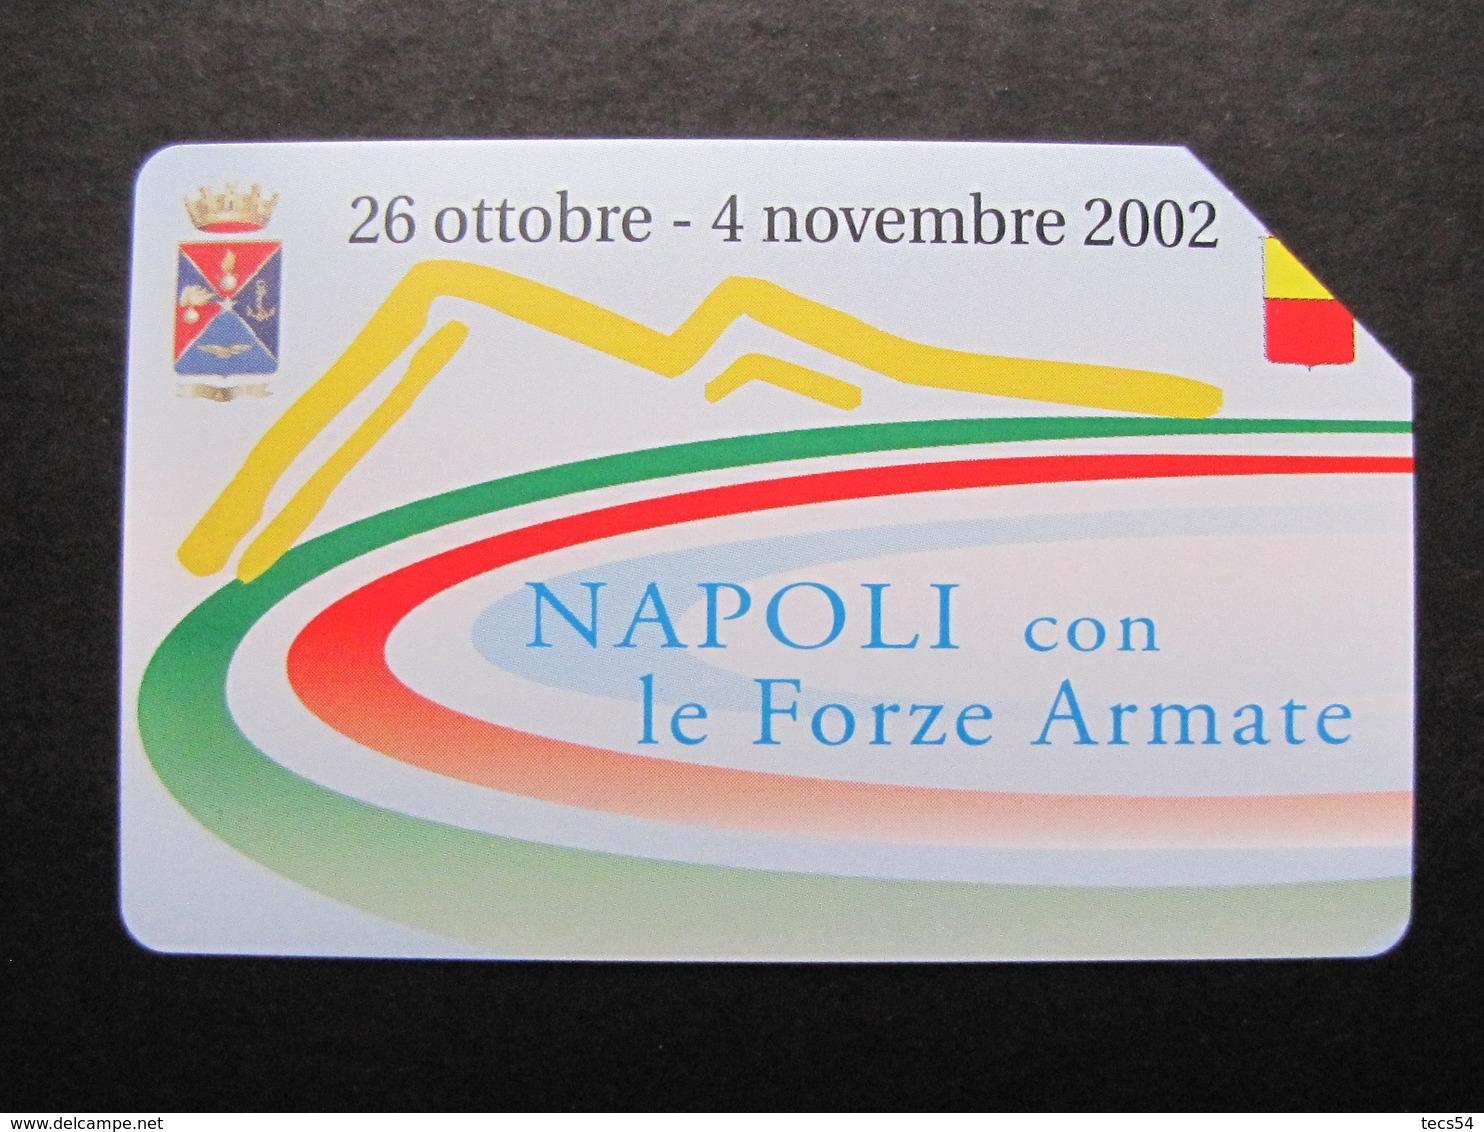 103 GOLDEN EURO - NAPOLI CON LE FORZE ARMATE - USATA - Public Advertising